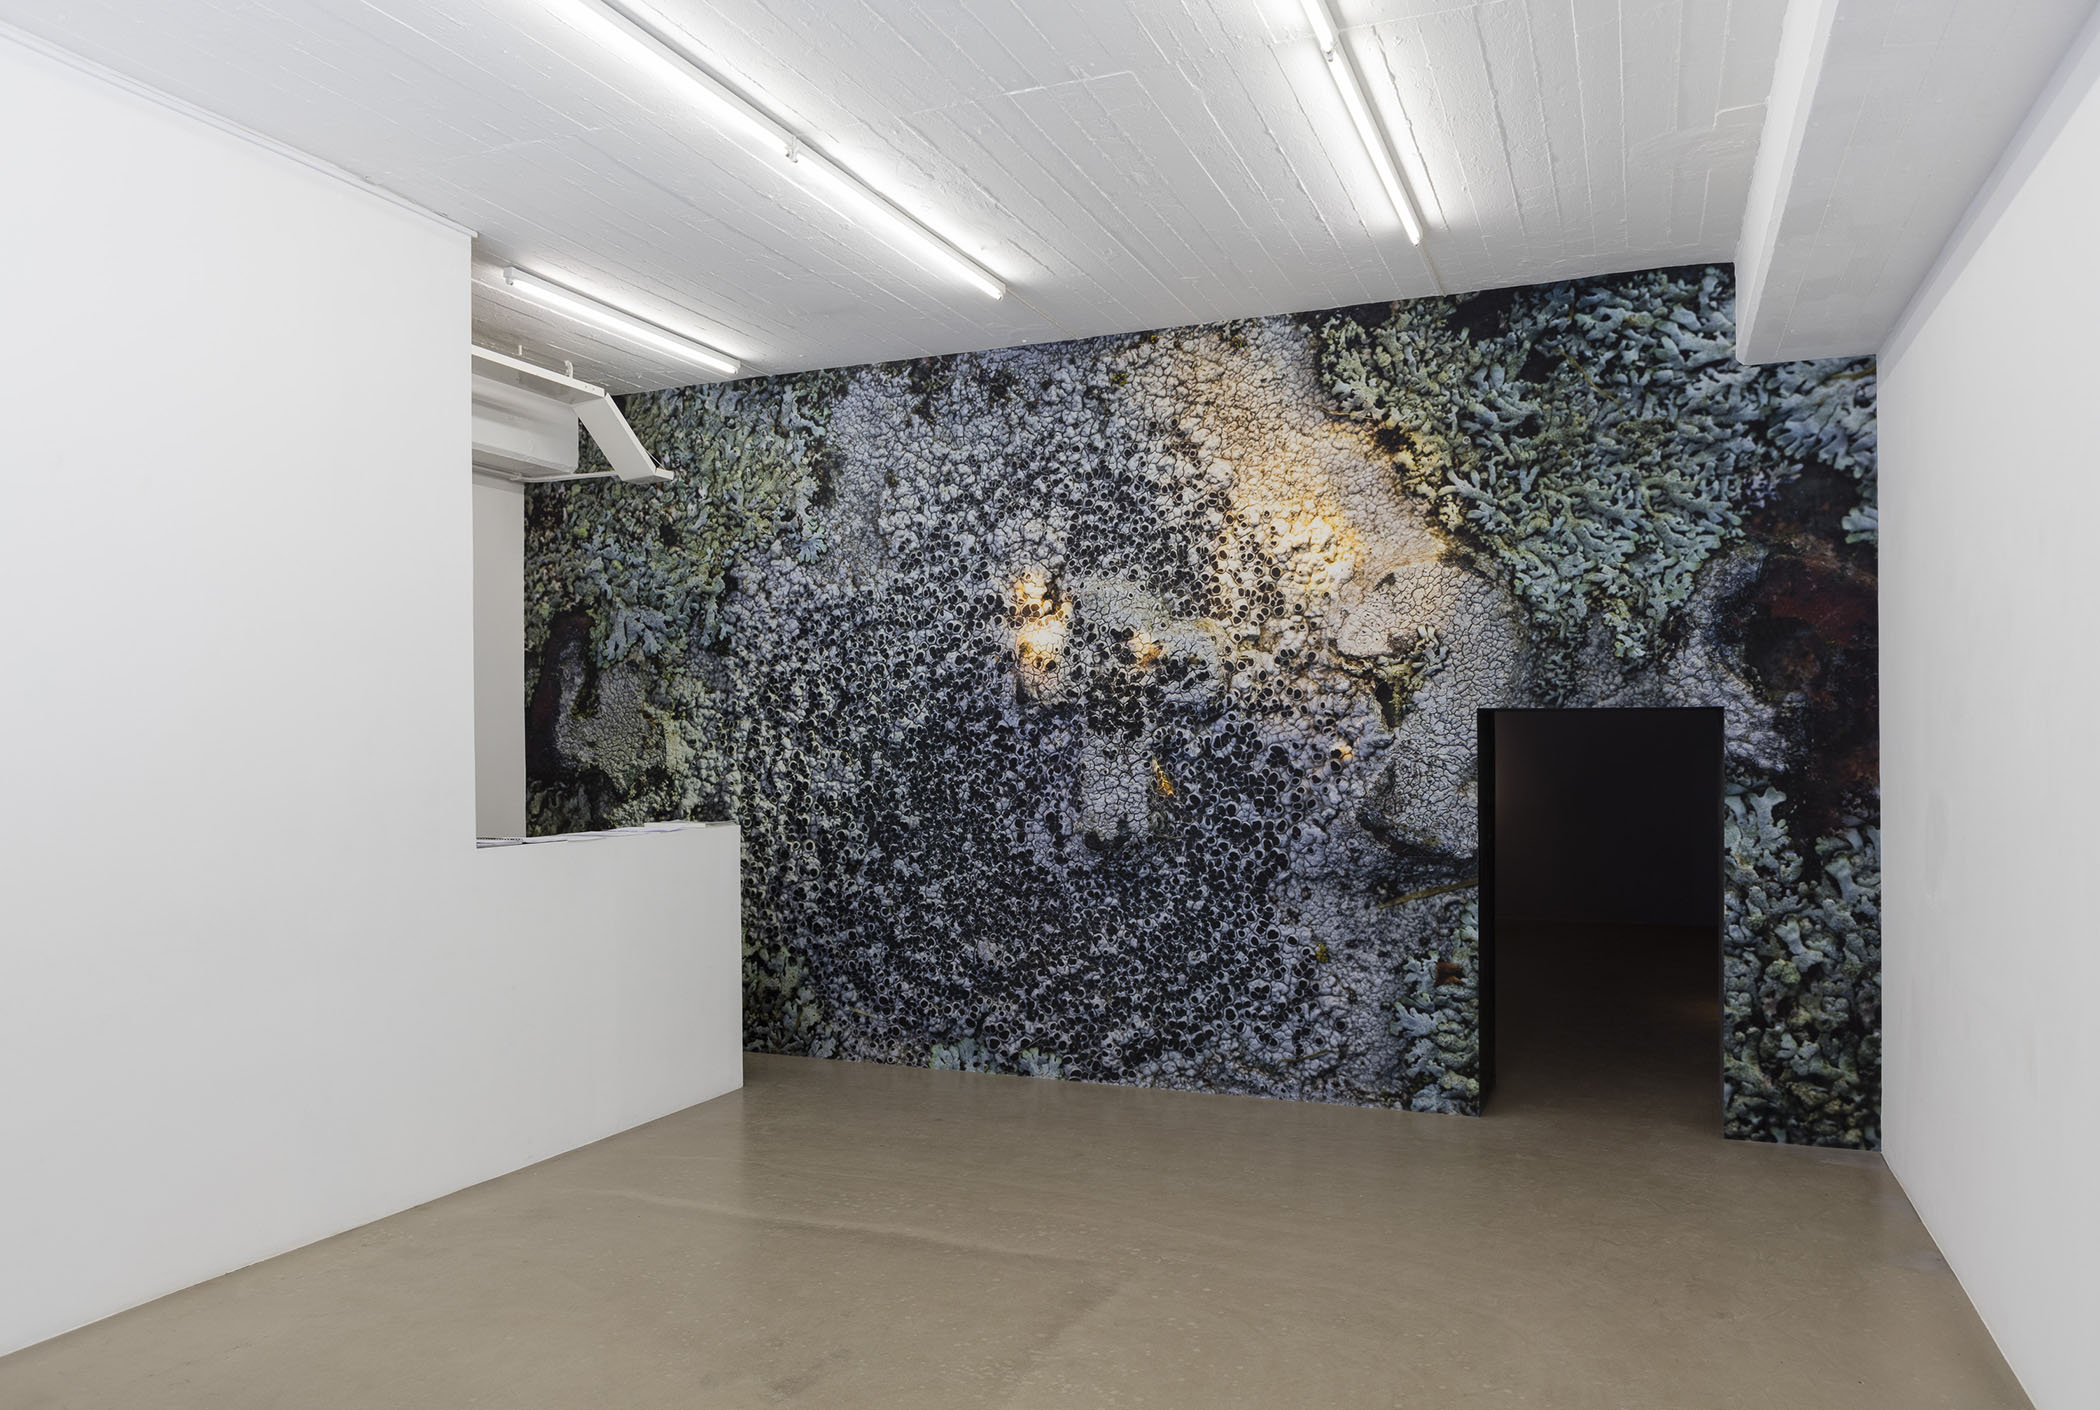 Oscar Furbacken - Conciliatory Gate, photo print on poly wall, 330x630 cm, 2017